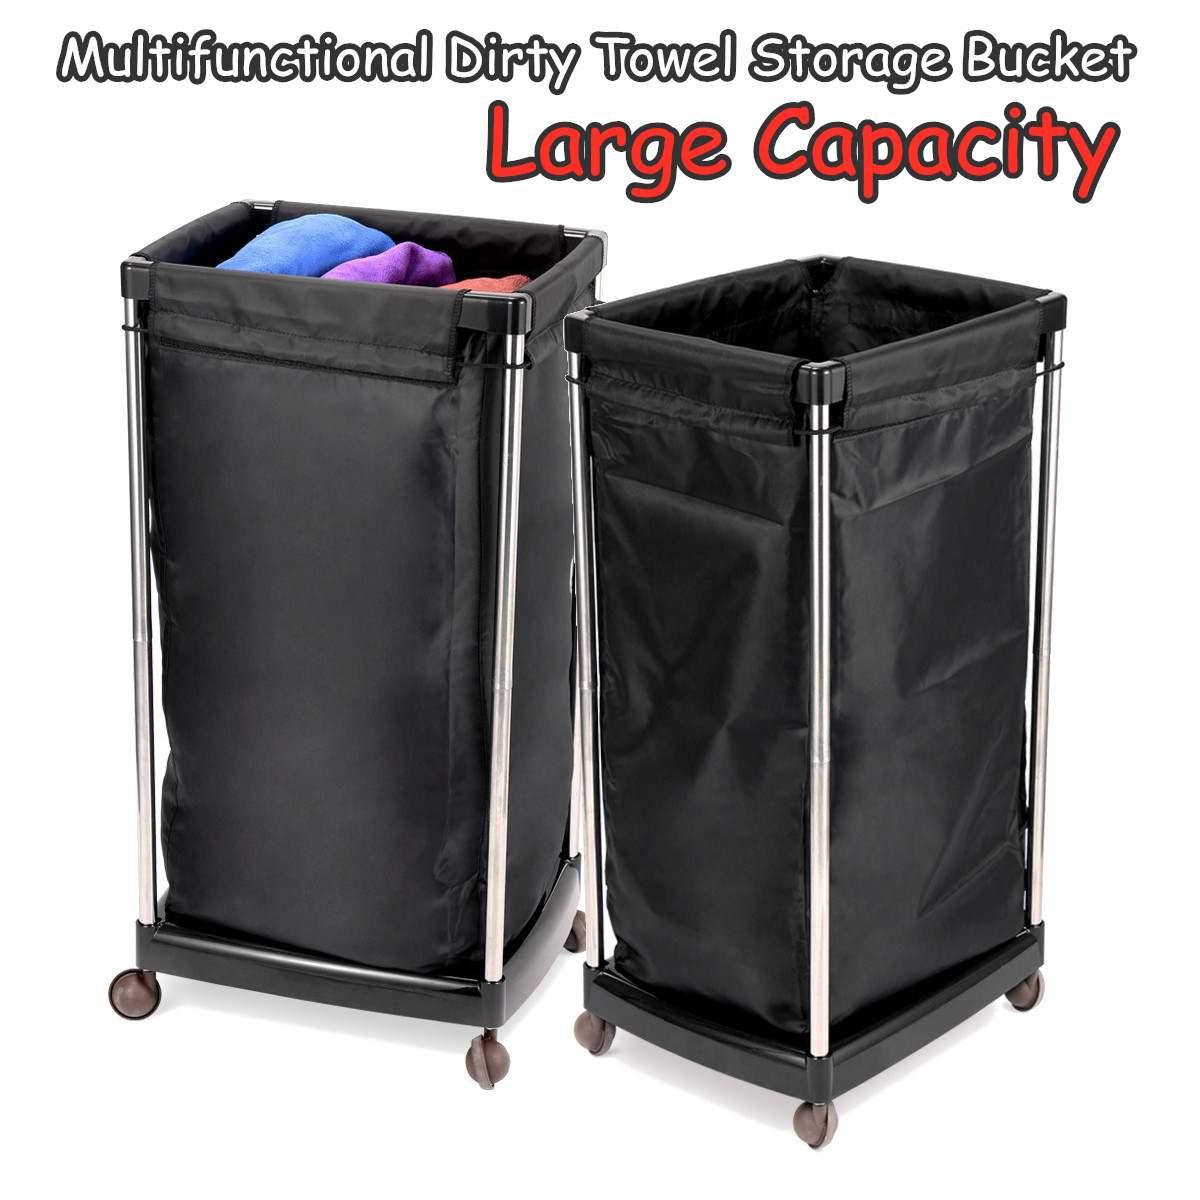 Salon Hotel Gym Bath Dirty Towel Storage Basket with Wheels Laundry Clothes Organizer Bucket Trolley Cart Reusable Multifunction